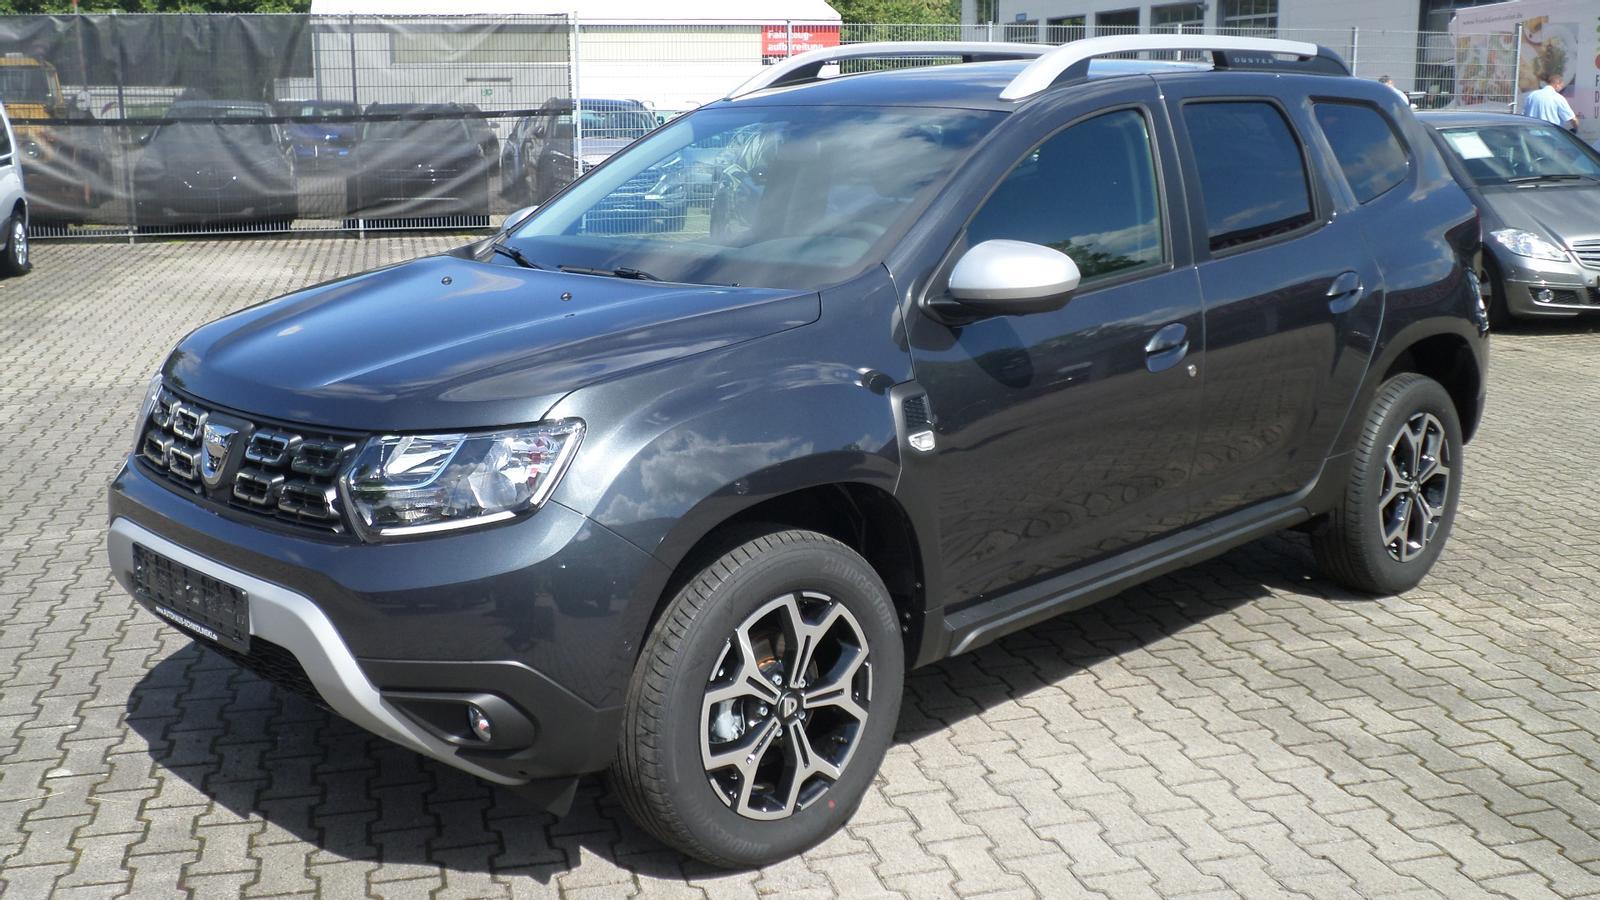 Dacia Duster 1.3 TCE Prestige + Paket Pro, Jahr 2021, Benzin